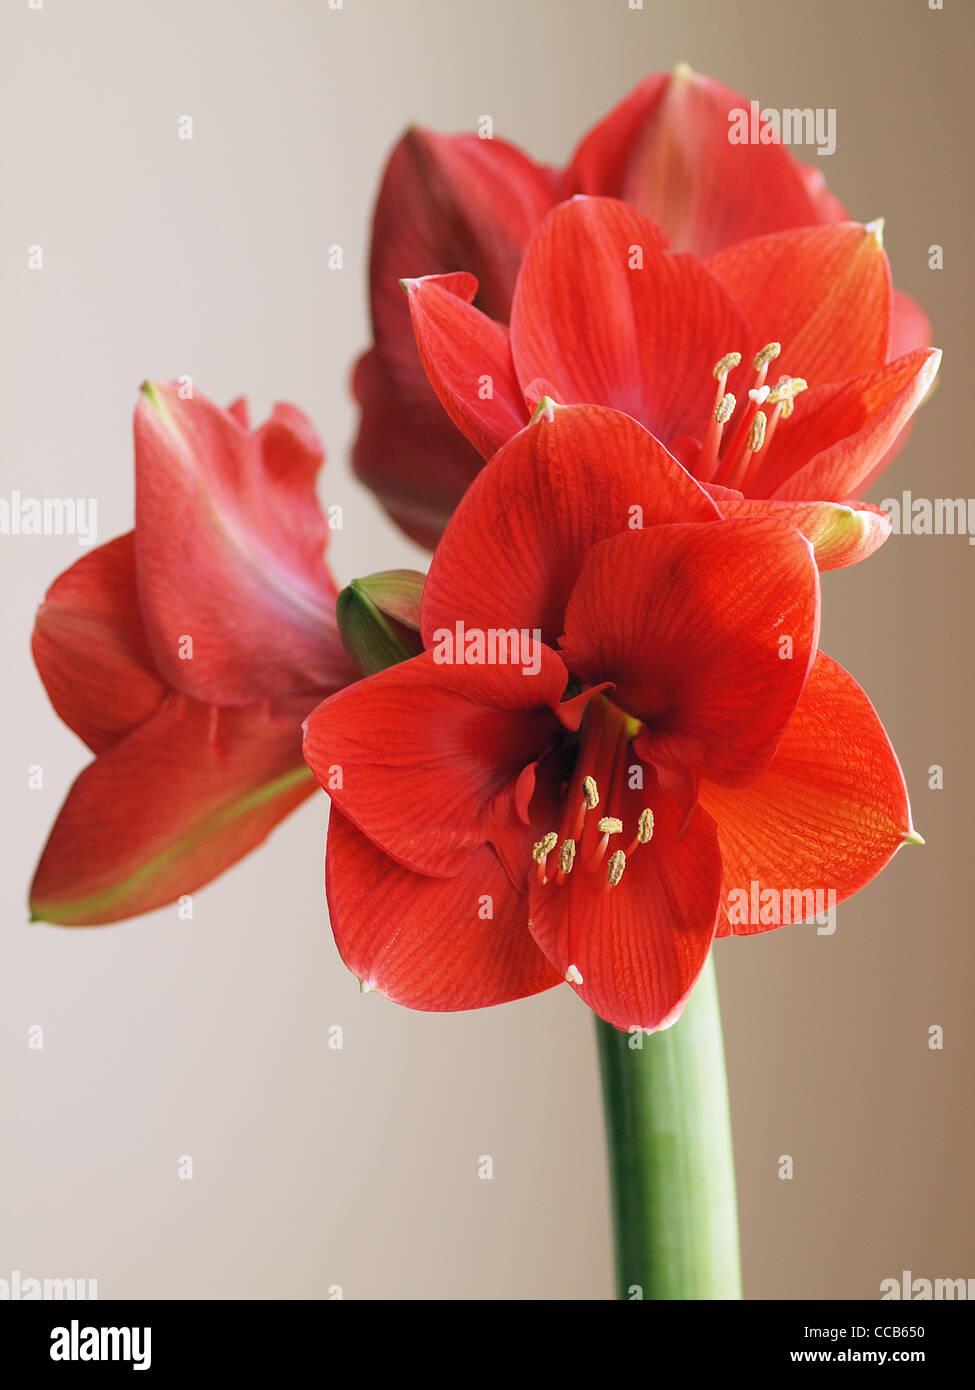 Red Amaryllis flower Stock Photo